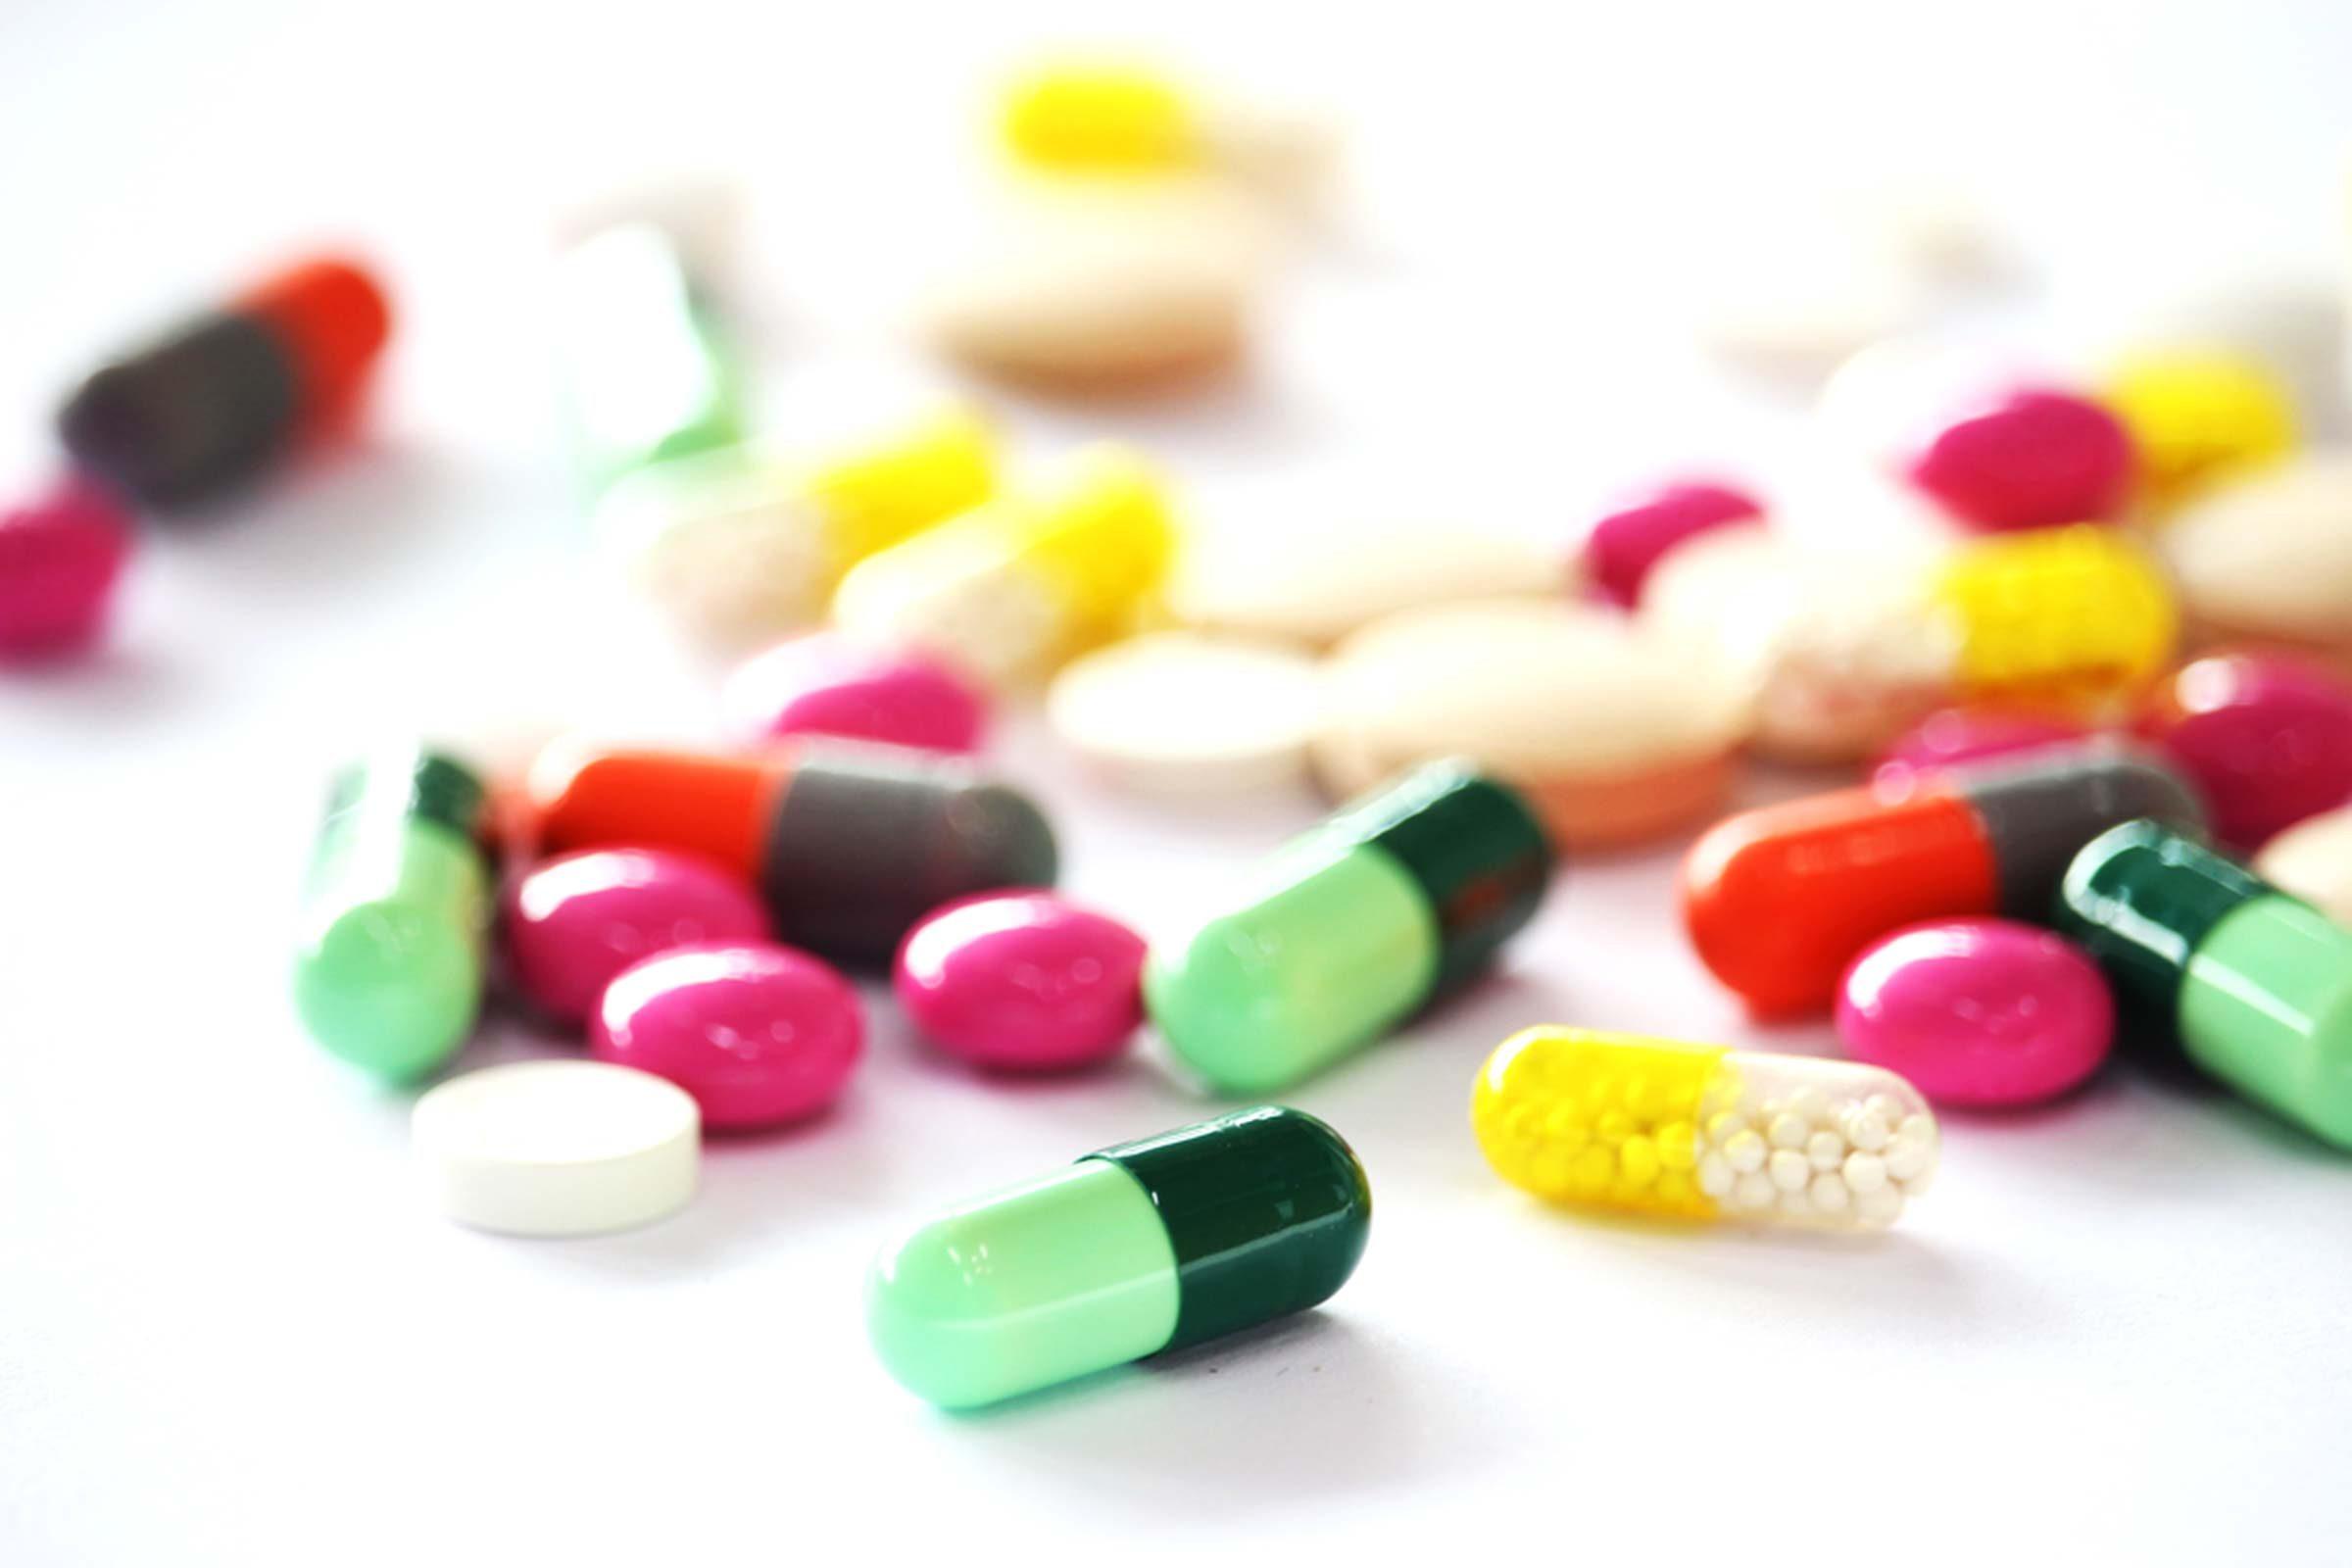 assortment of pills and capsules